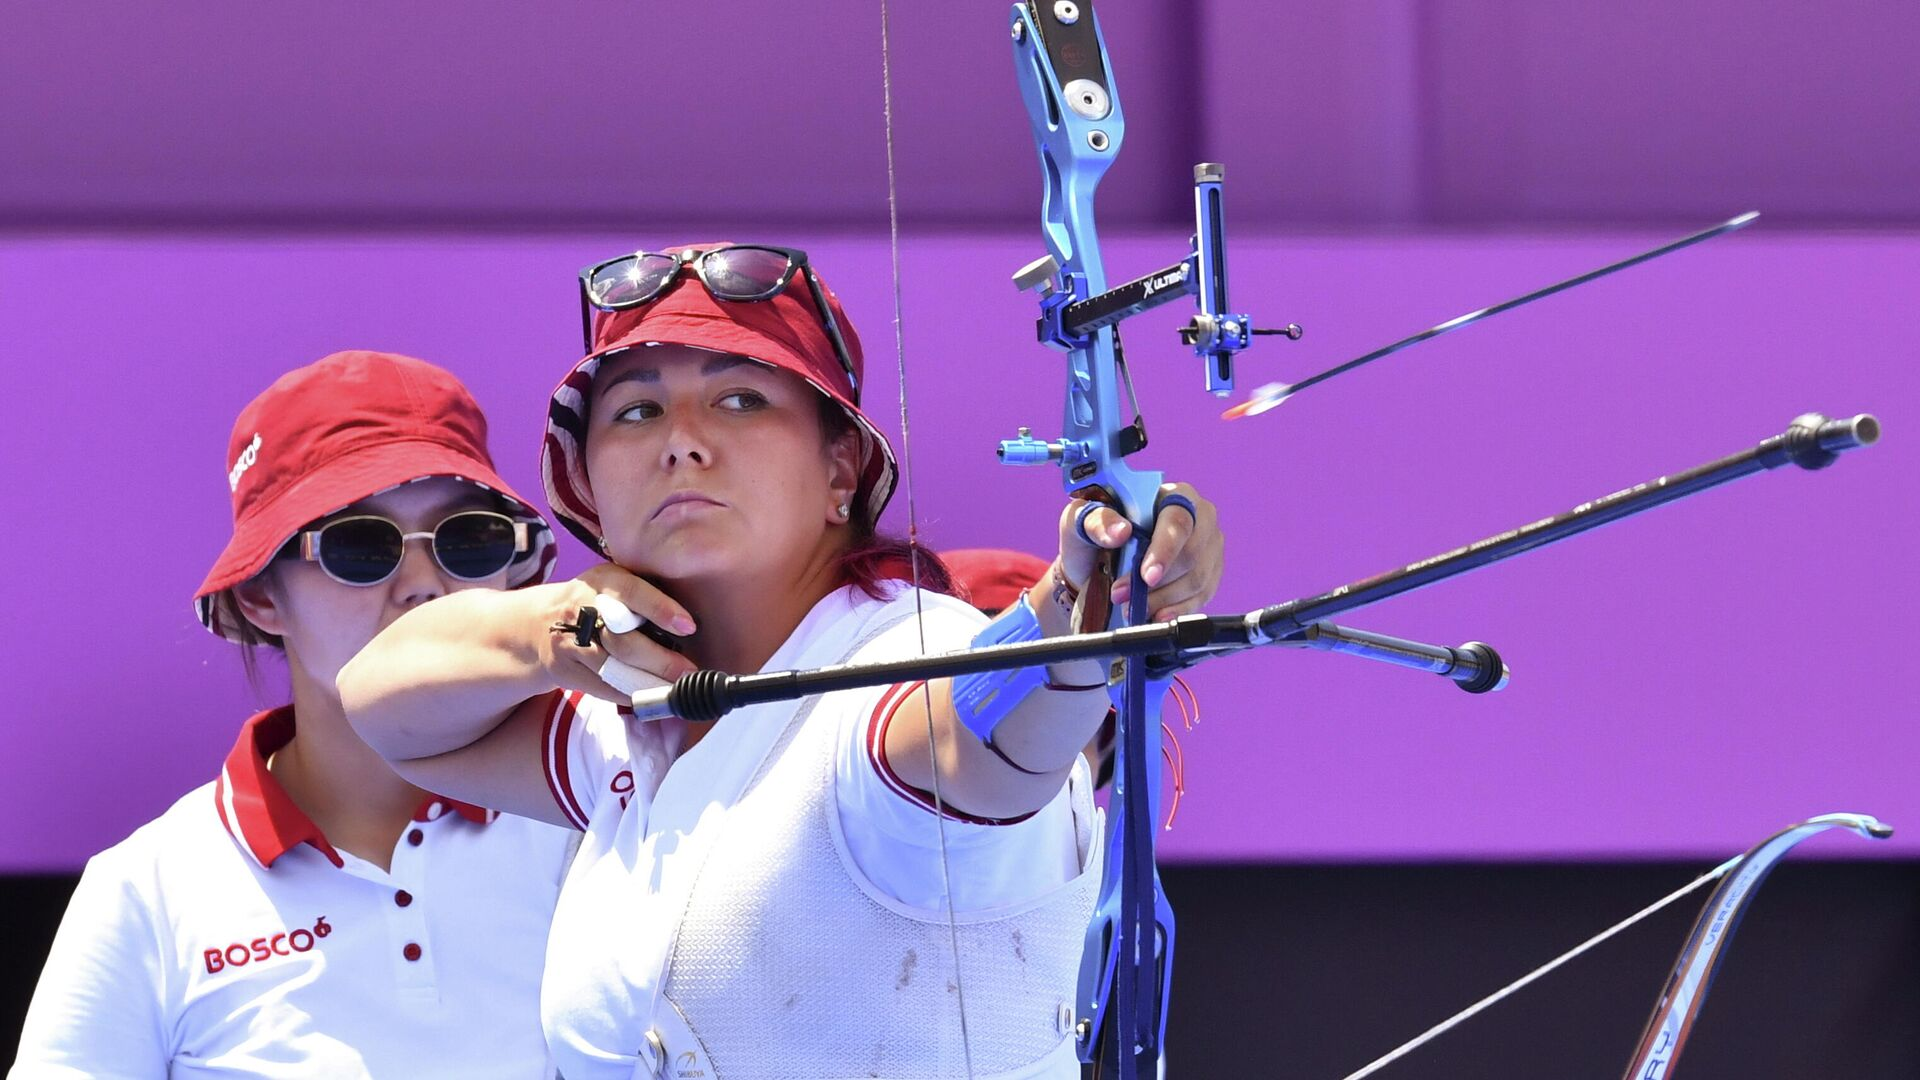 Elena Osipova, miembro del equipo femenino de tiro con arco del Comité Olímpico de Rusia  - Sputnik Mundo, 1920, 25.07.2021